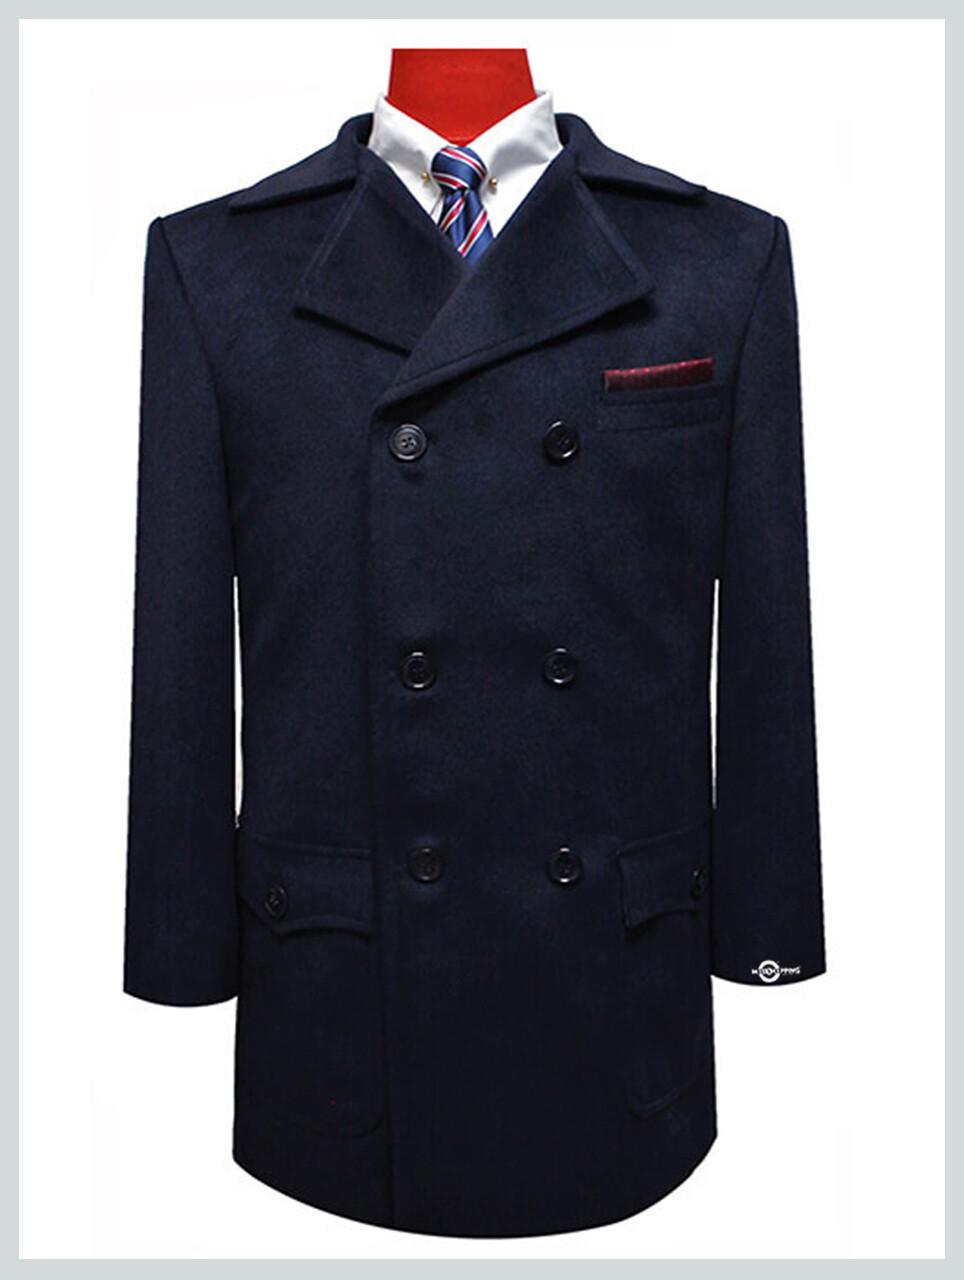 pea coat| retro vintage mod style wool classic navy blue peacoat